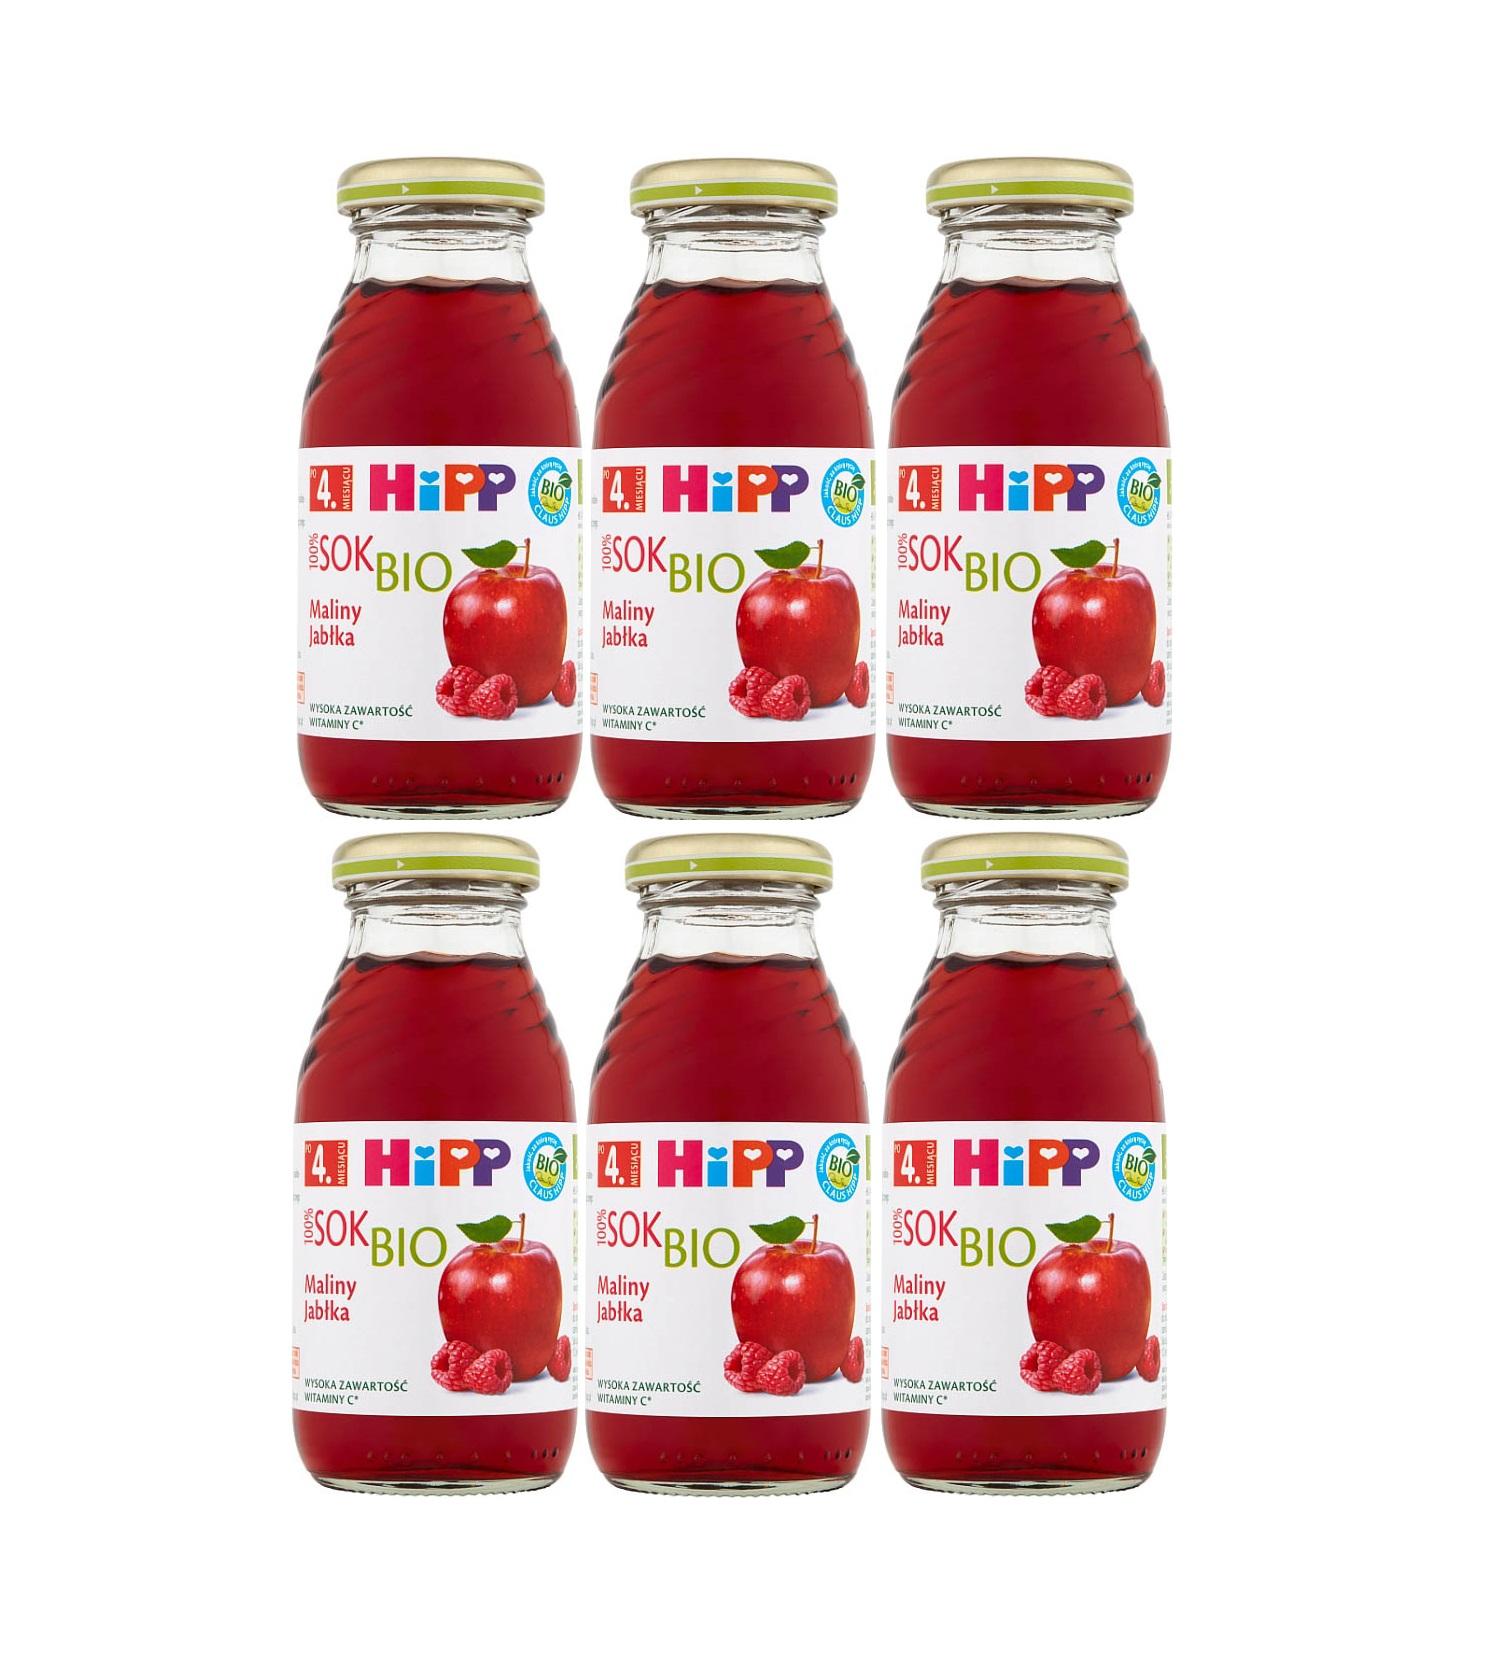 6 pack hipp 200ml sok malina jablka